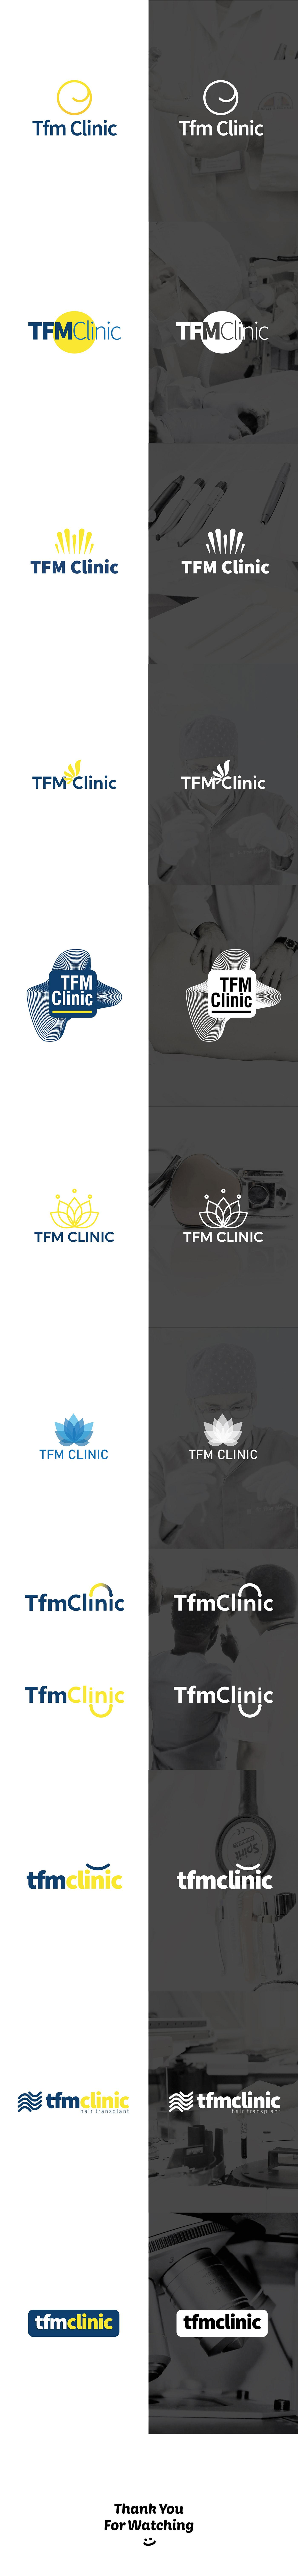 logo logo variation Logo Design